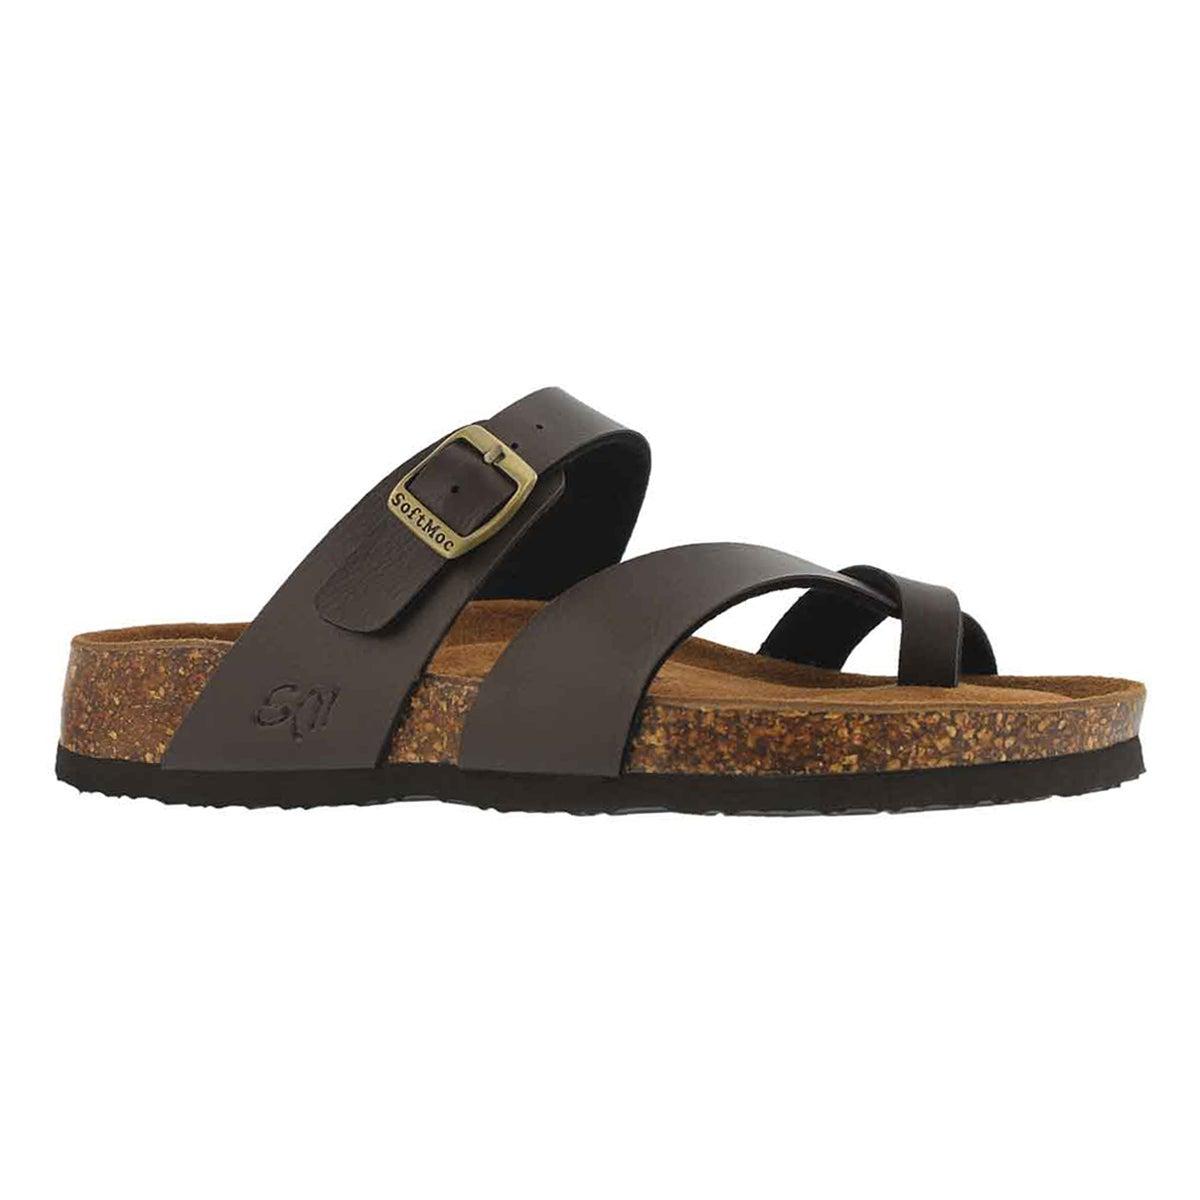 Lds Alicia 5 PU brn memory foam sandal